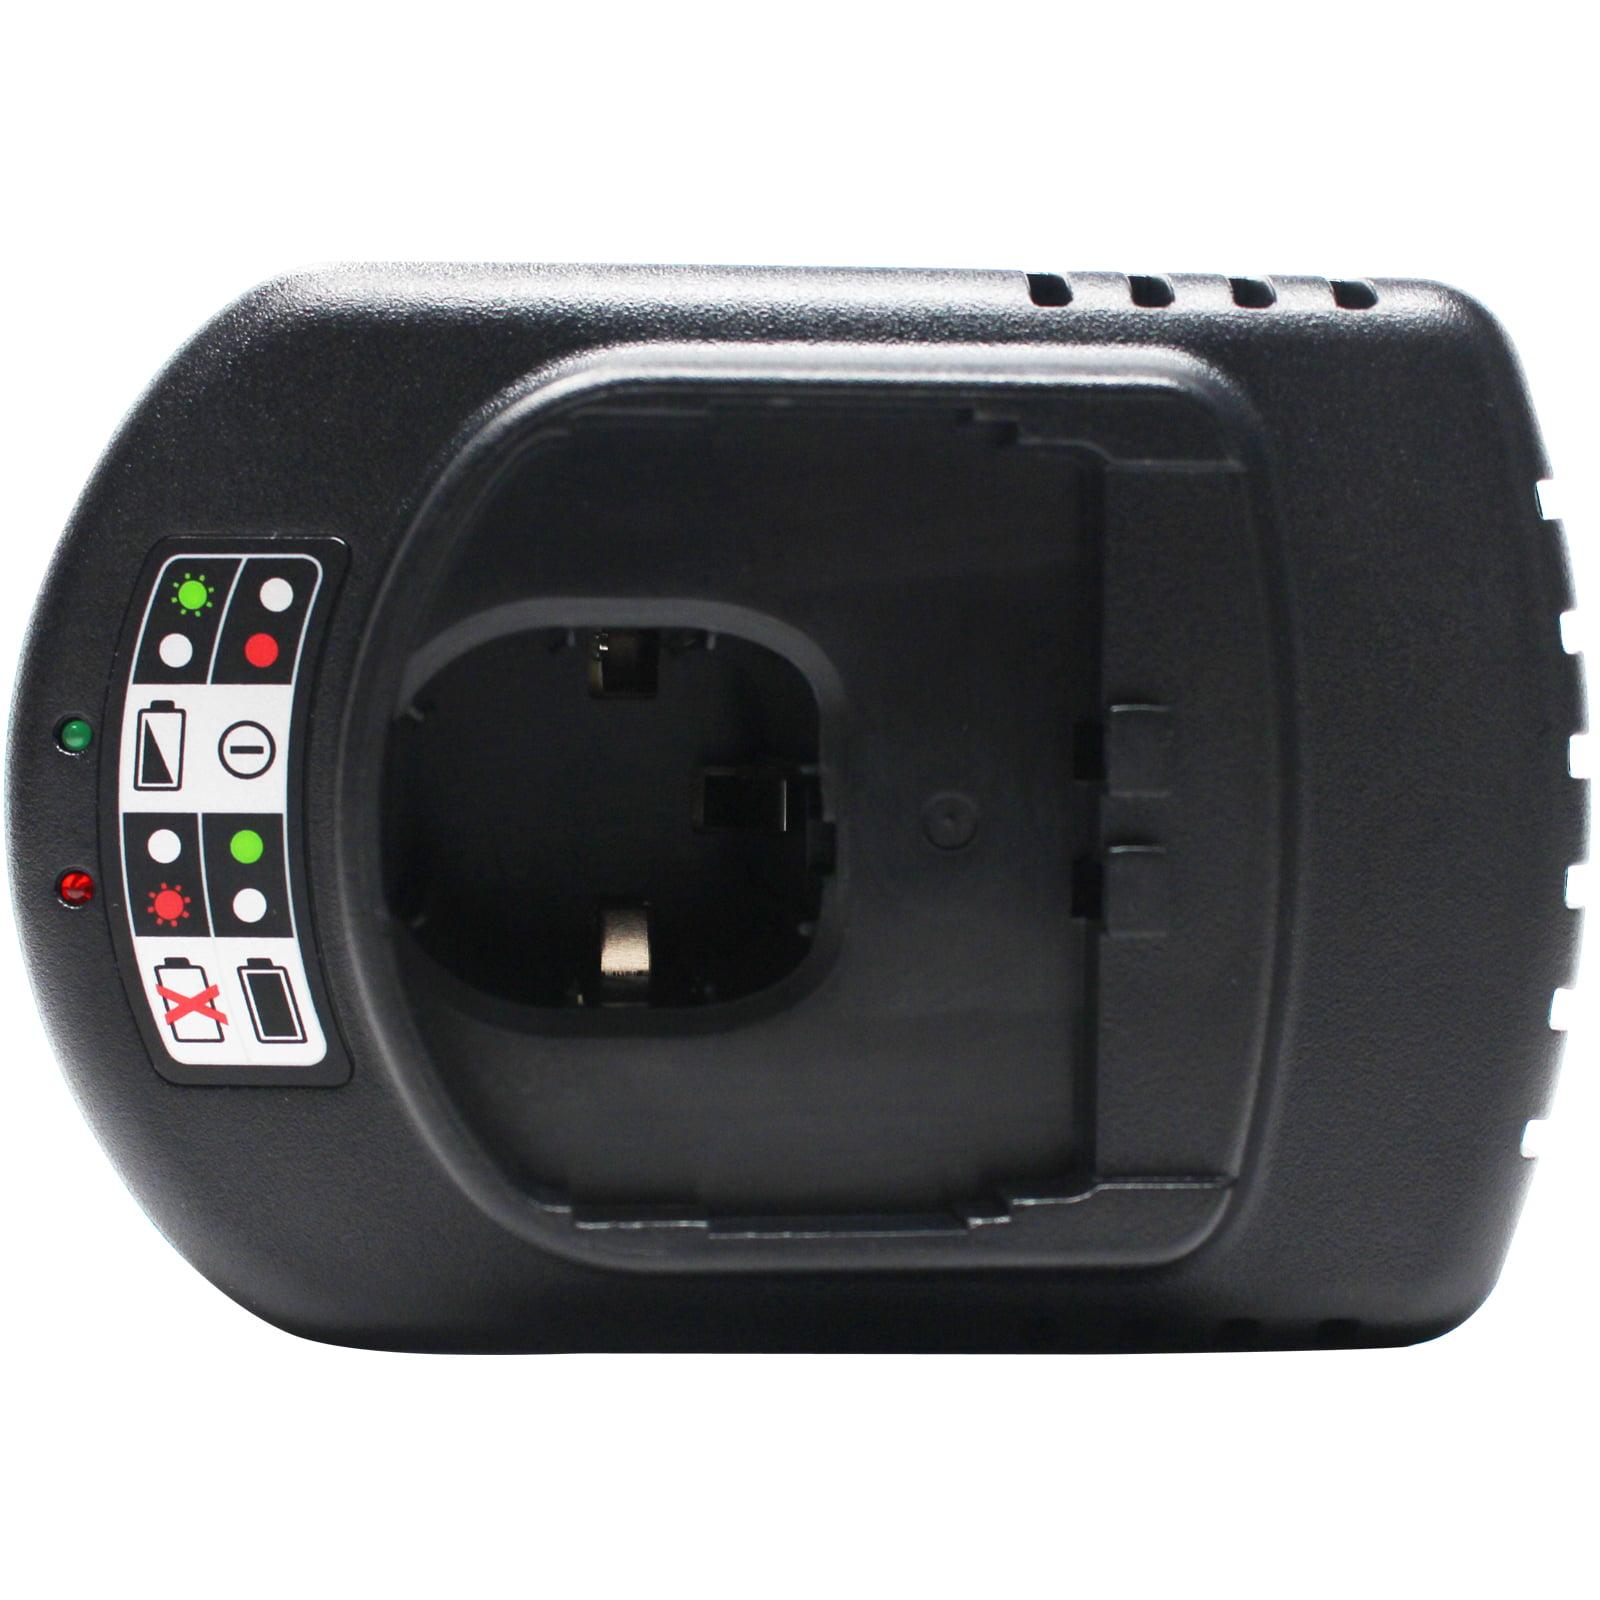 2-Pack - Ryobi P510 Battery + Universal Charger for Ryobi Replacement - For Ryobi 18V Power Tool Battery and Charger (1300mAh, NICD) - image 3 de 4